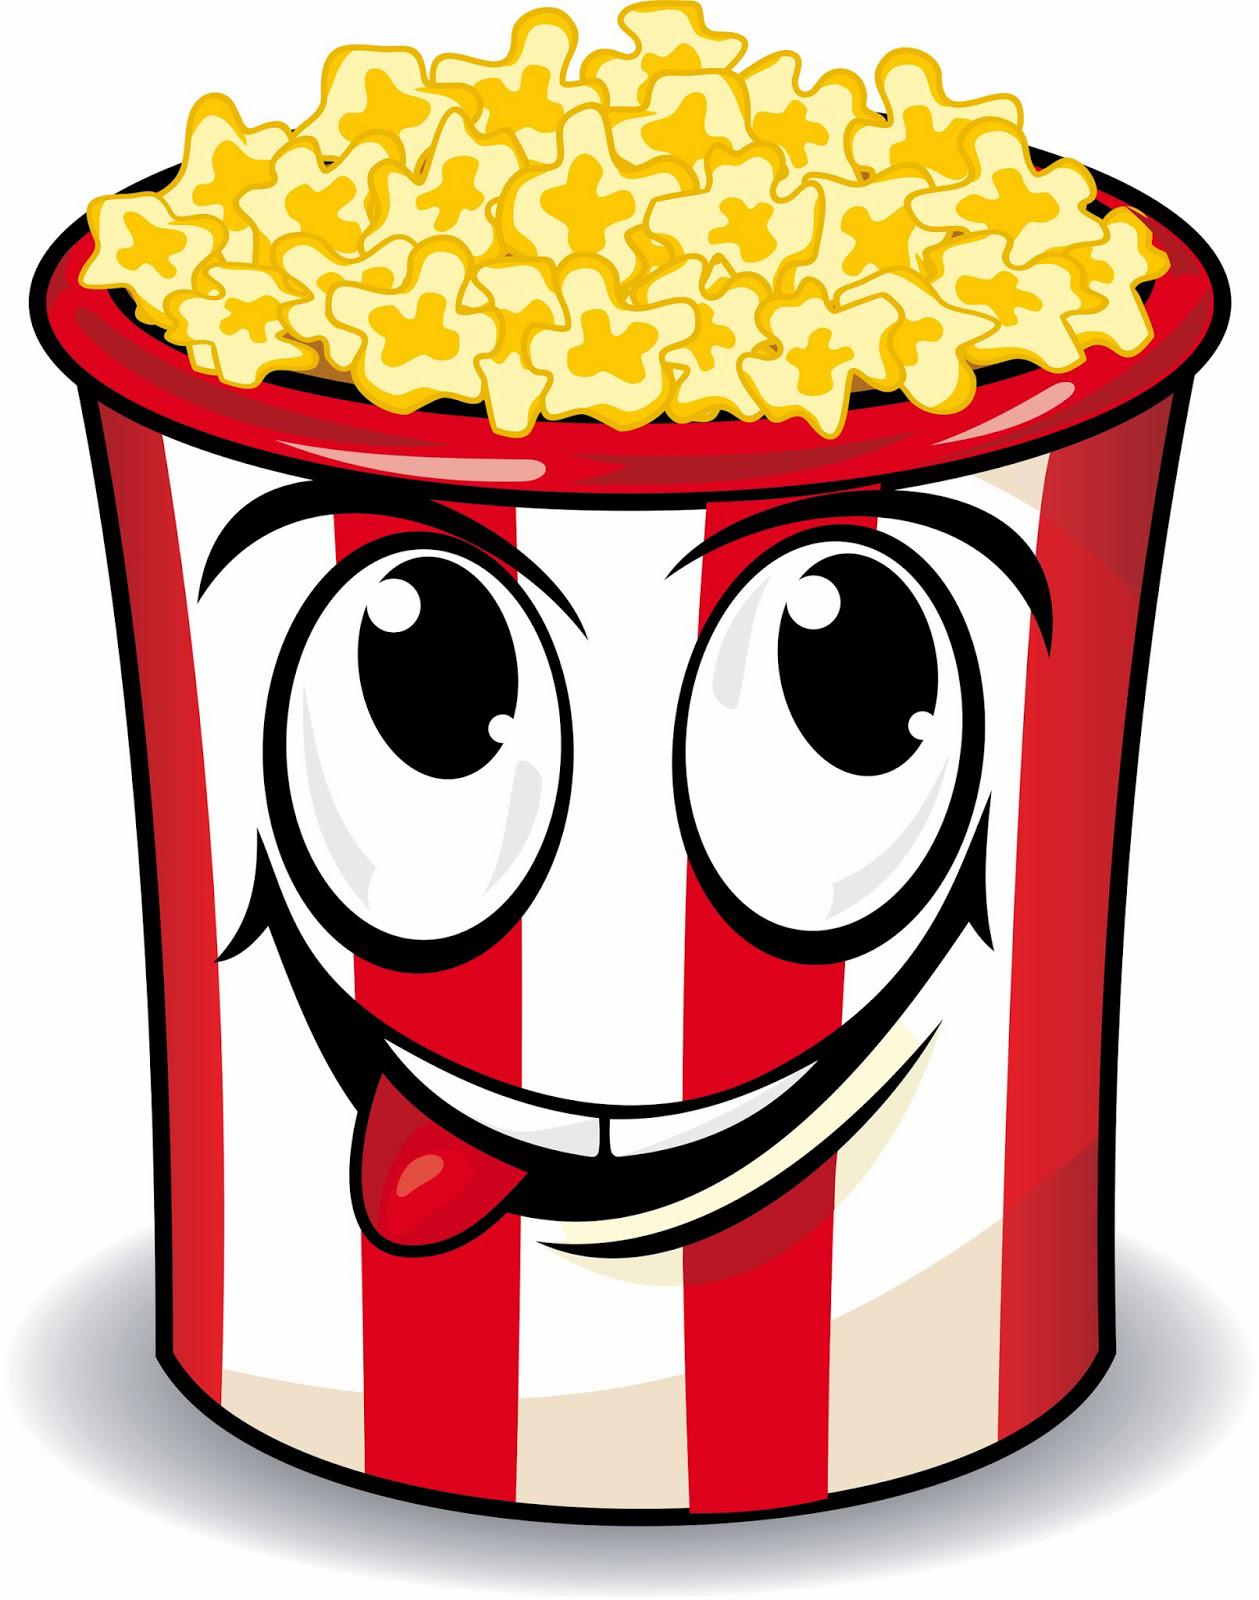 Popcorn clipart caramel popcorn For District Az Scouts Positions